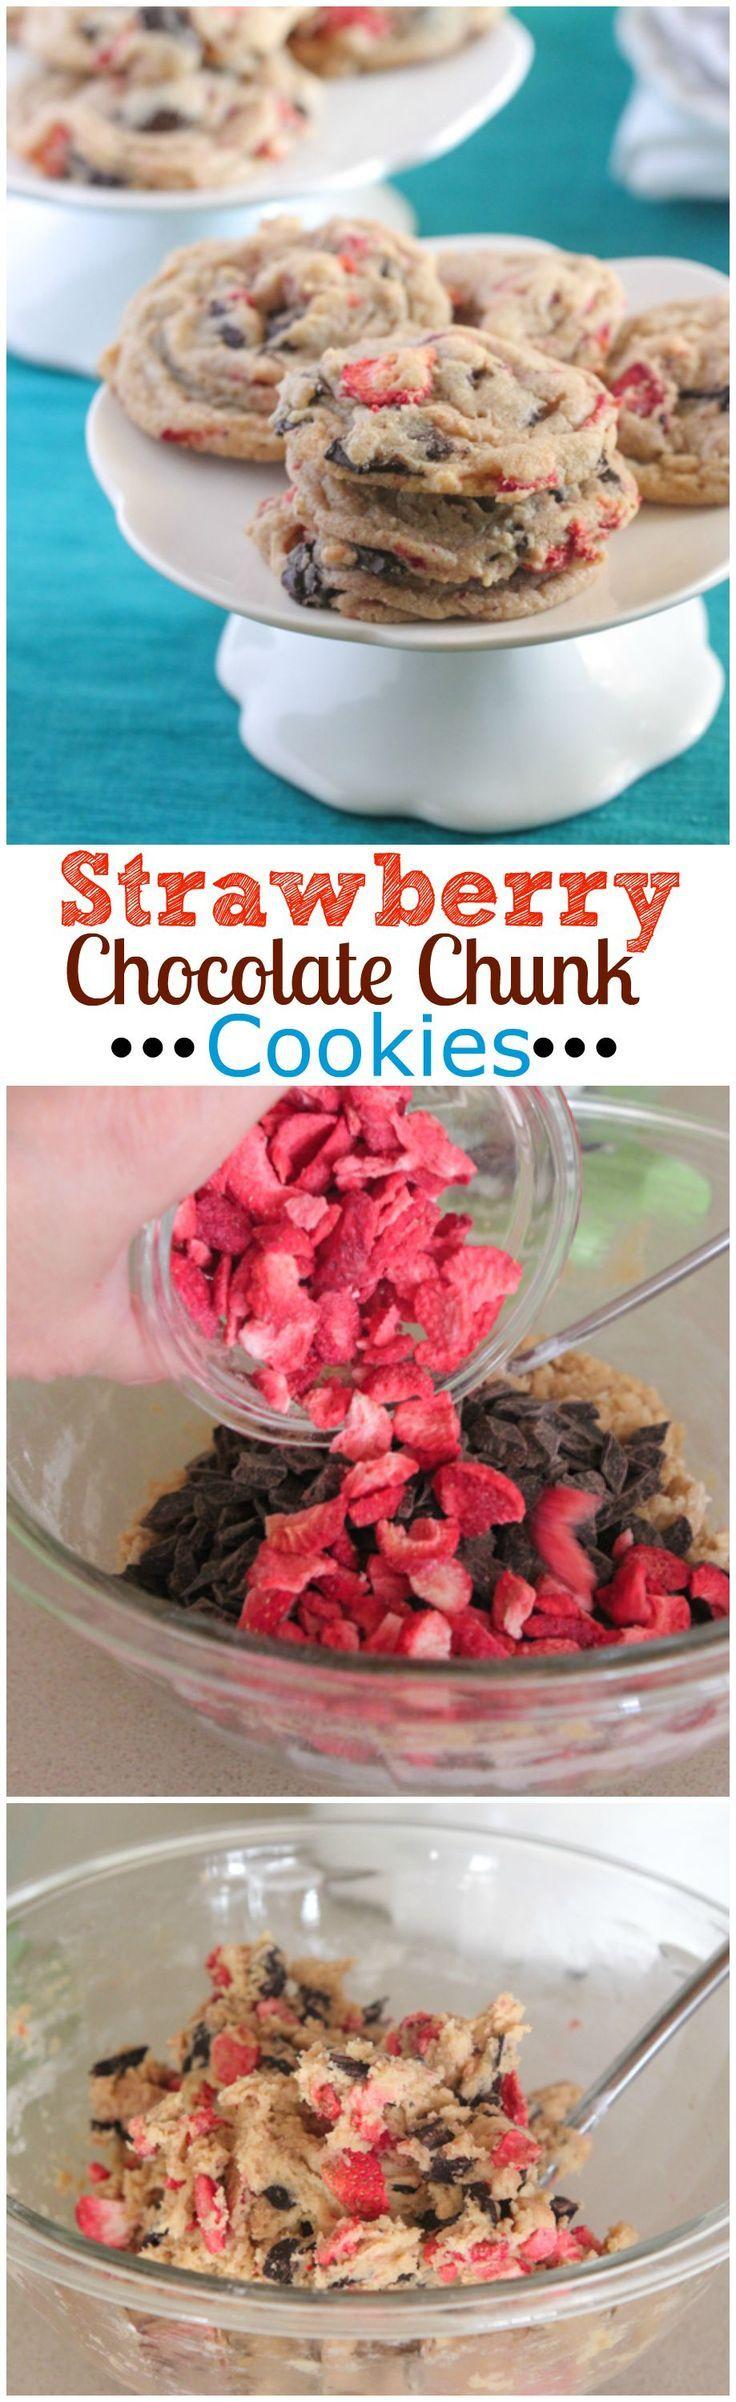 Strawberry Chocolate Chunk Cookies #freezedriedstrawberries